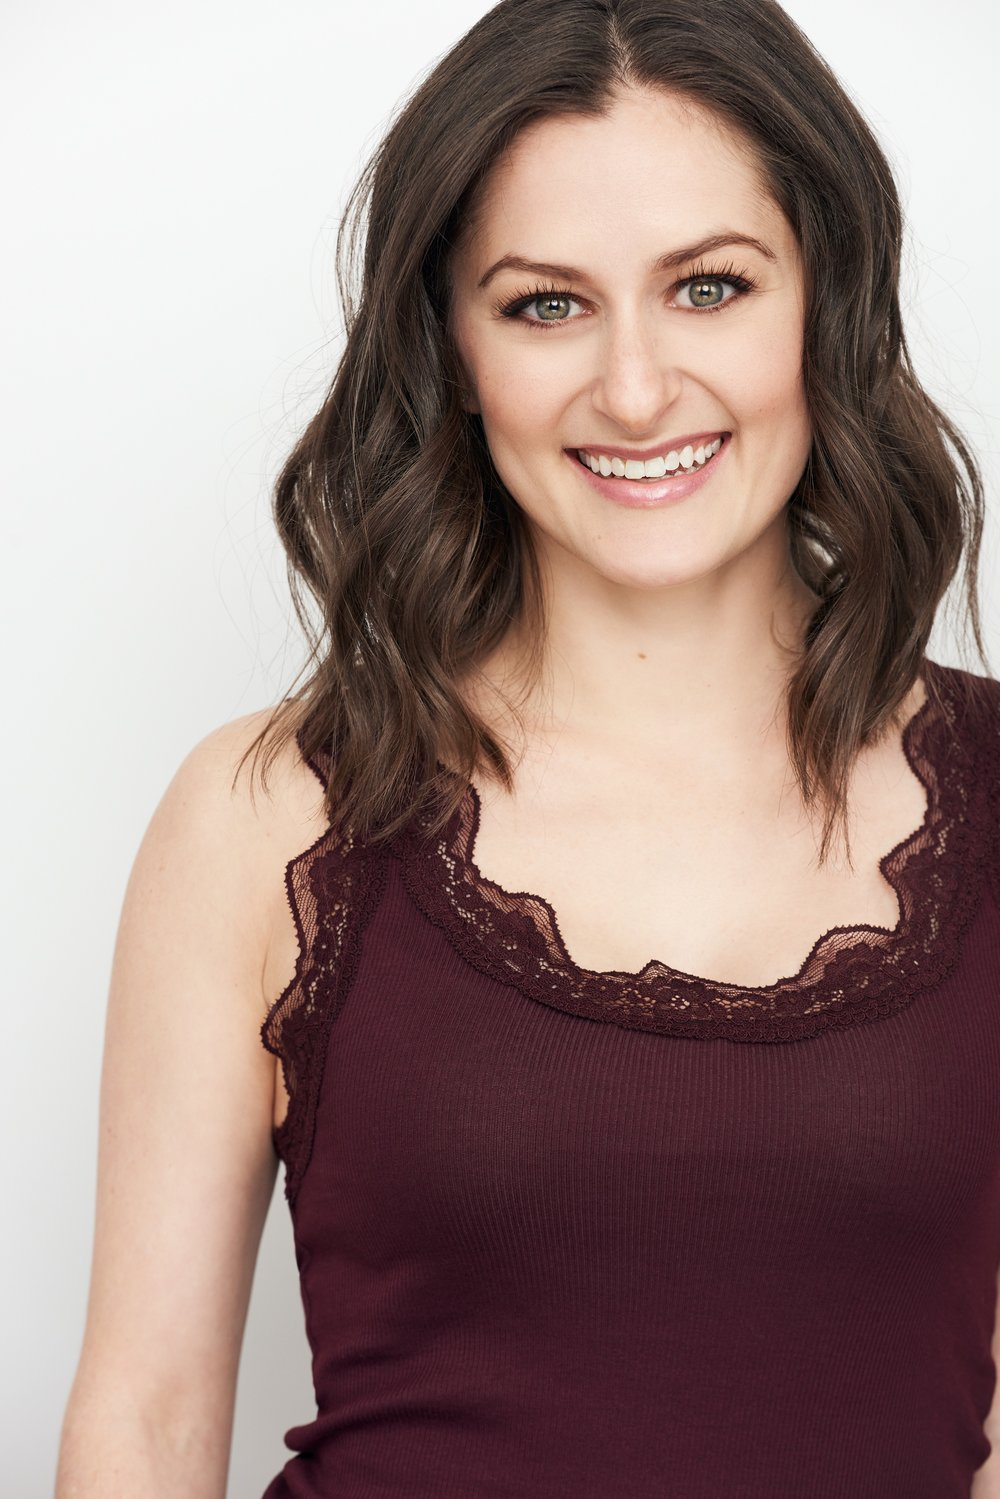 Amanda LaMotte